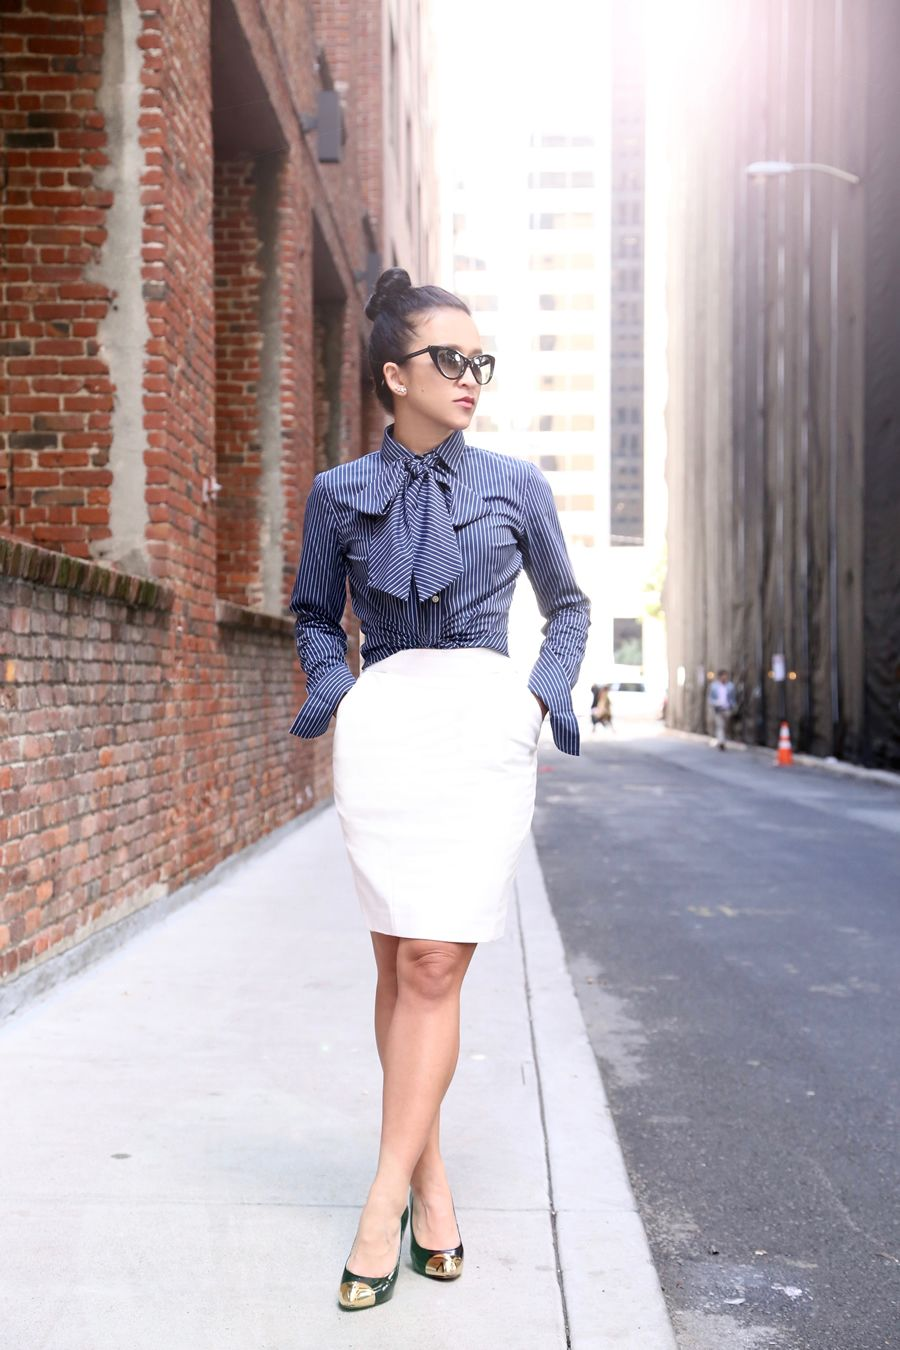 da528cb2cc946a Banana Republic Riley Bow blouse and pencil skirt